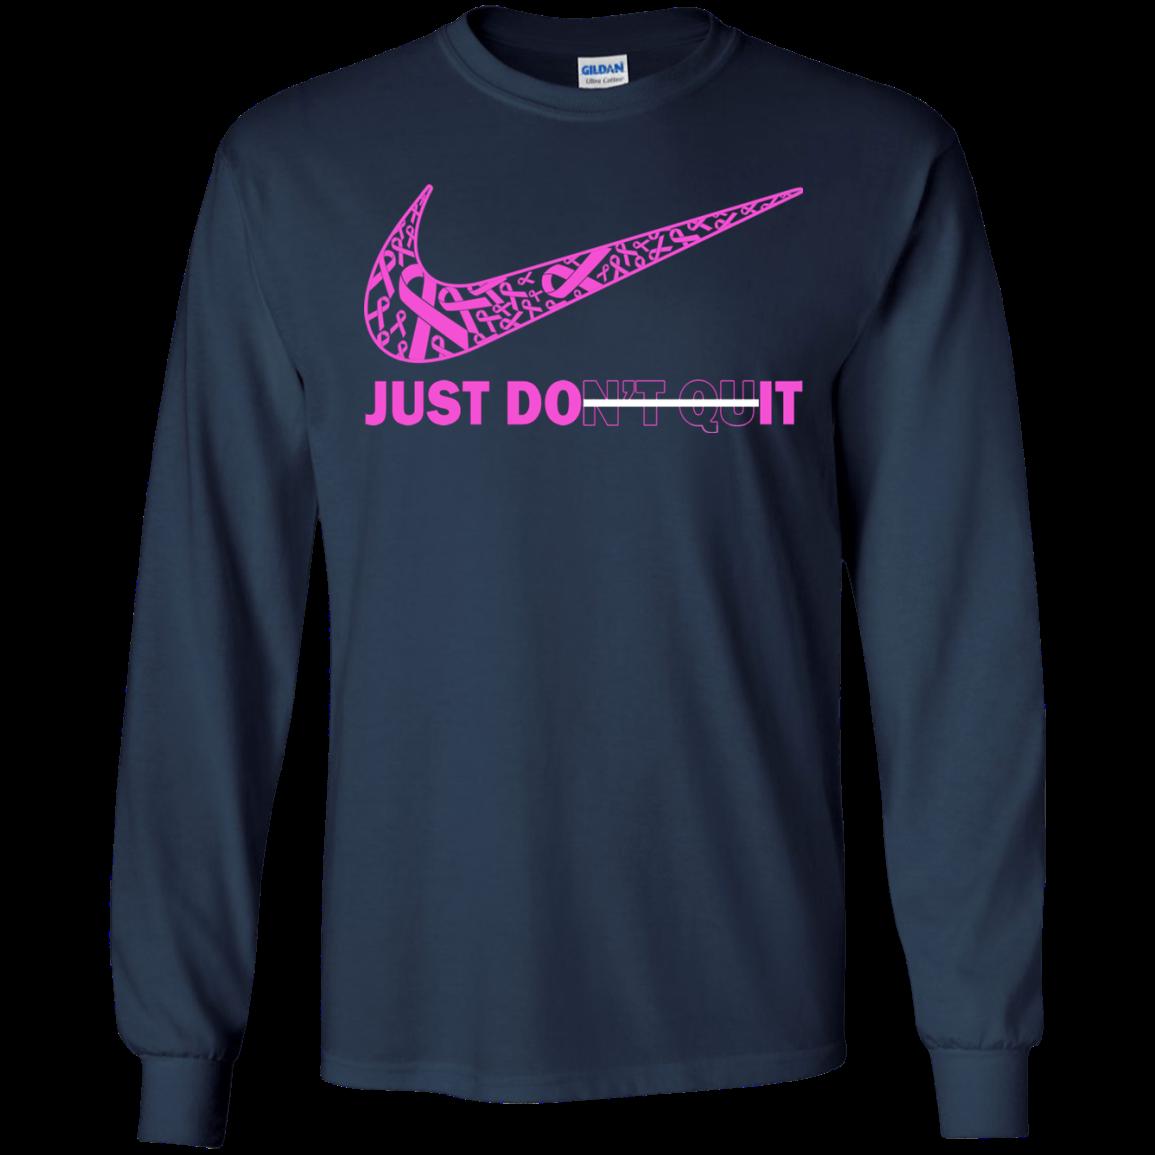 Just do it hoodies